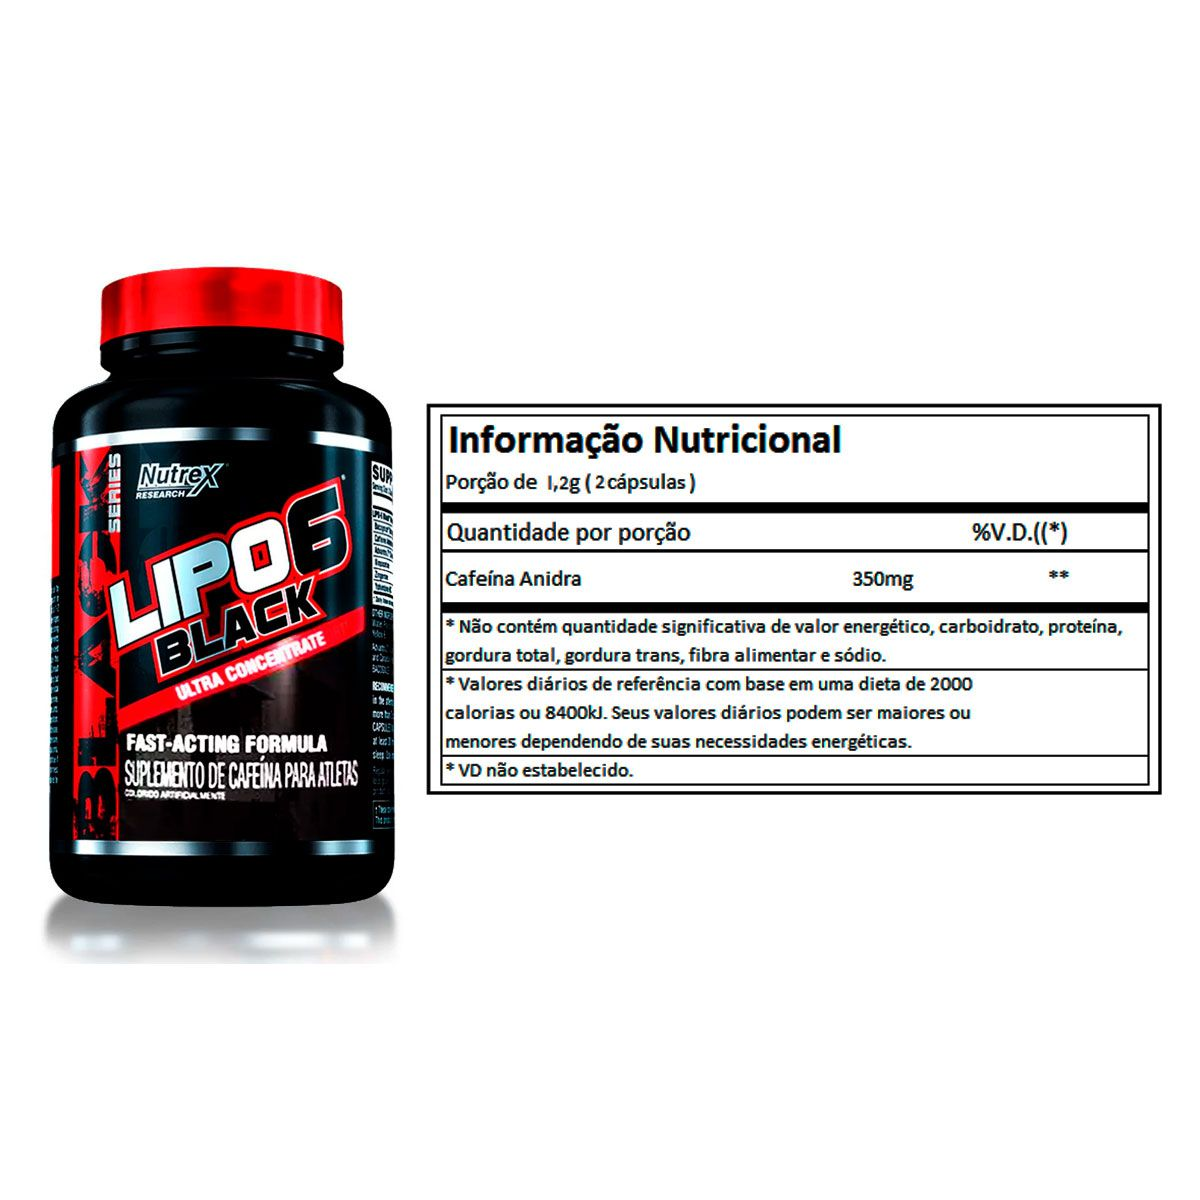 Kit Lipo 6 Black 60 Caps + Vitadap 60 Caps - Nutrex